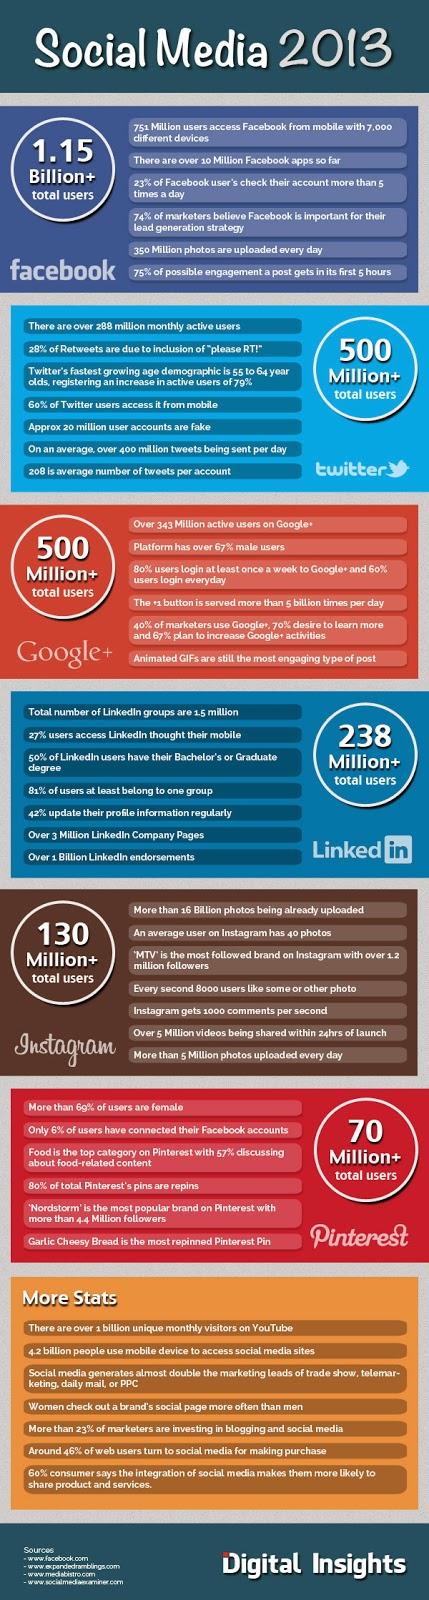 Buy Facebook Likes - Importance of Social Media